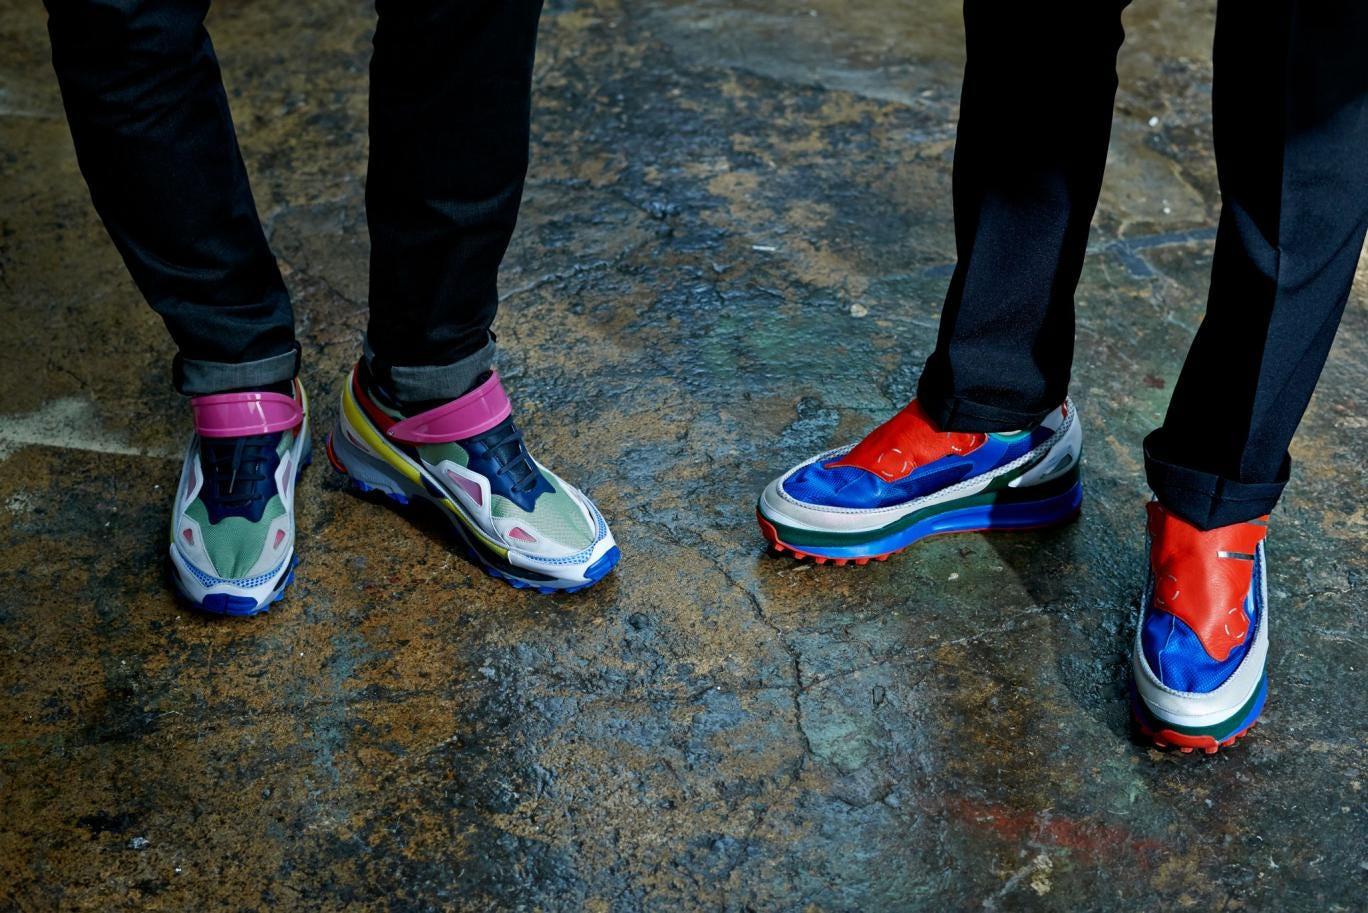 Adidas has bridged the gap between streets and catwalks